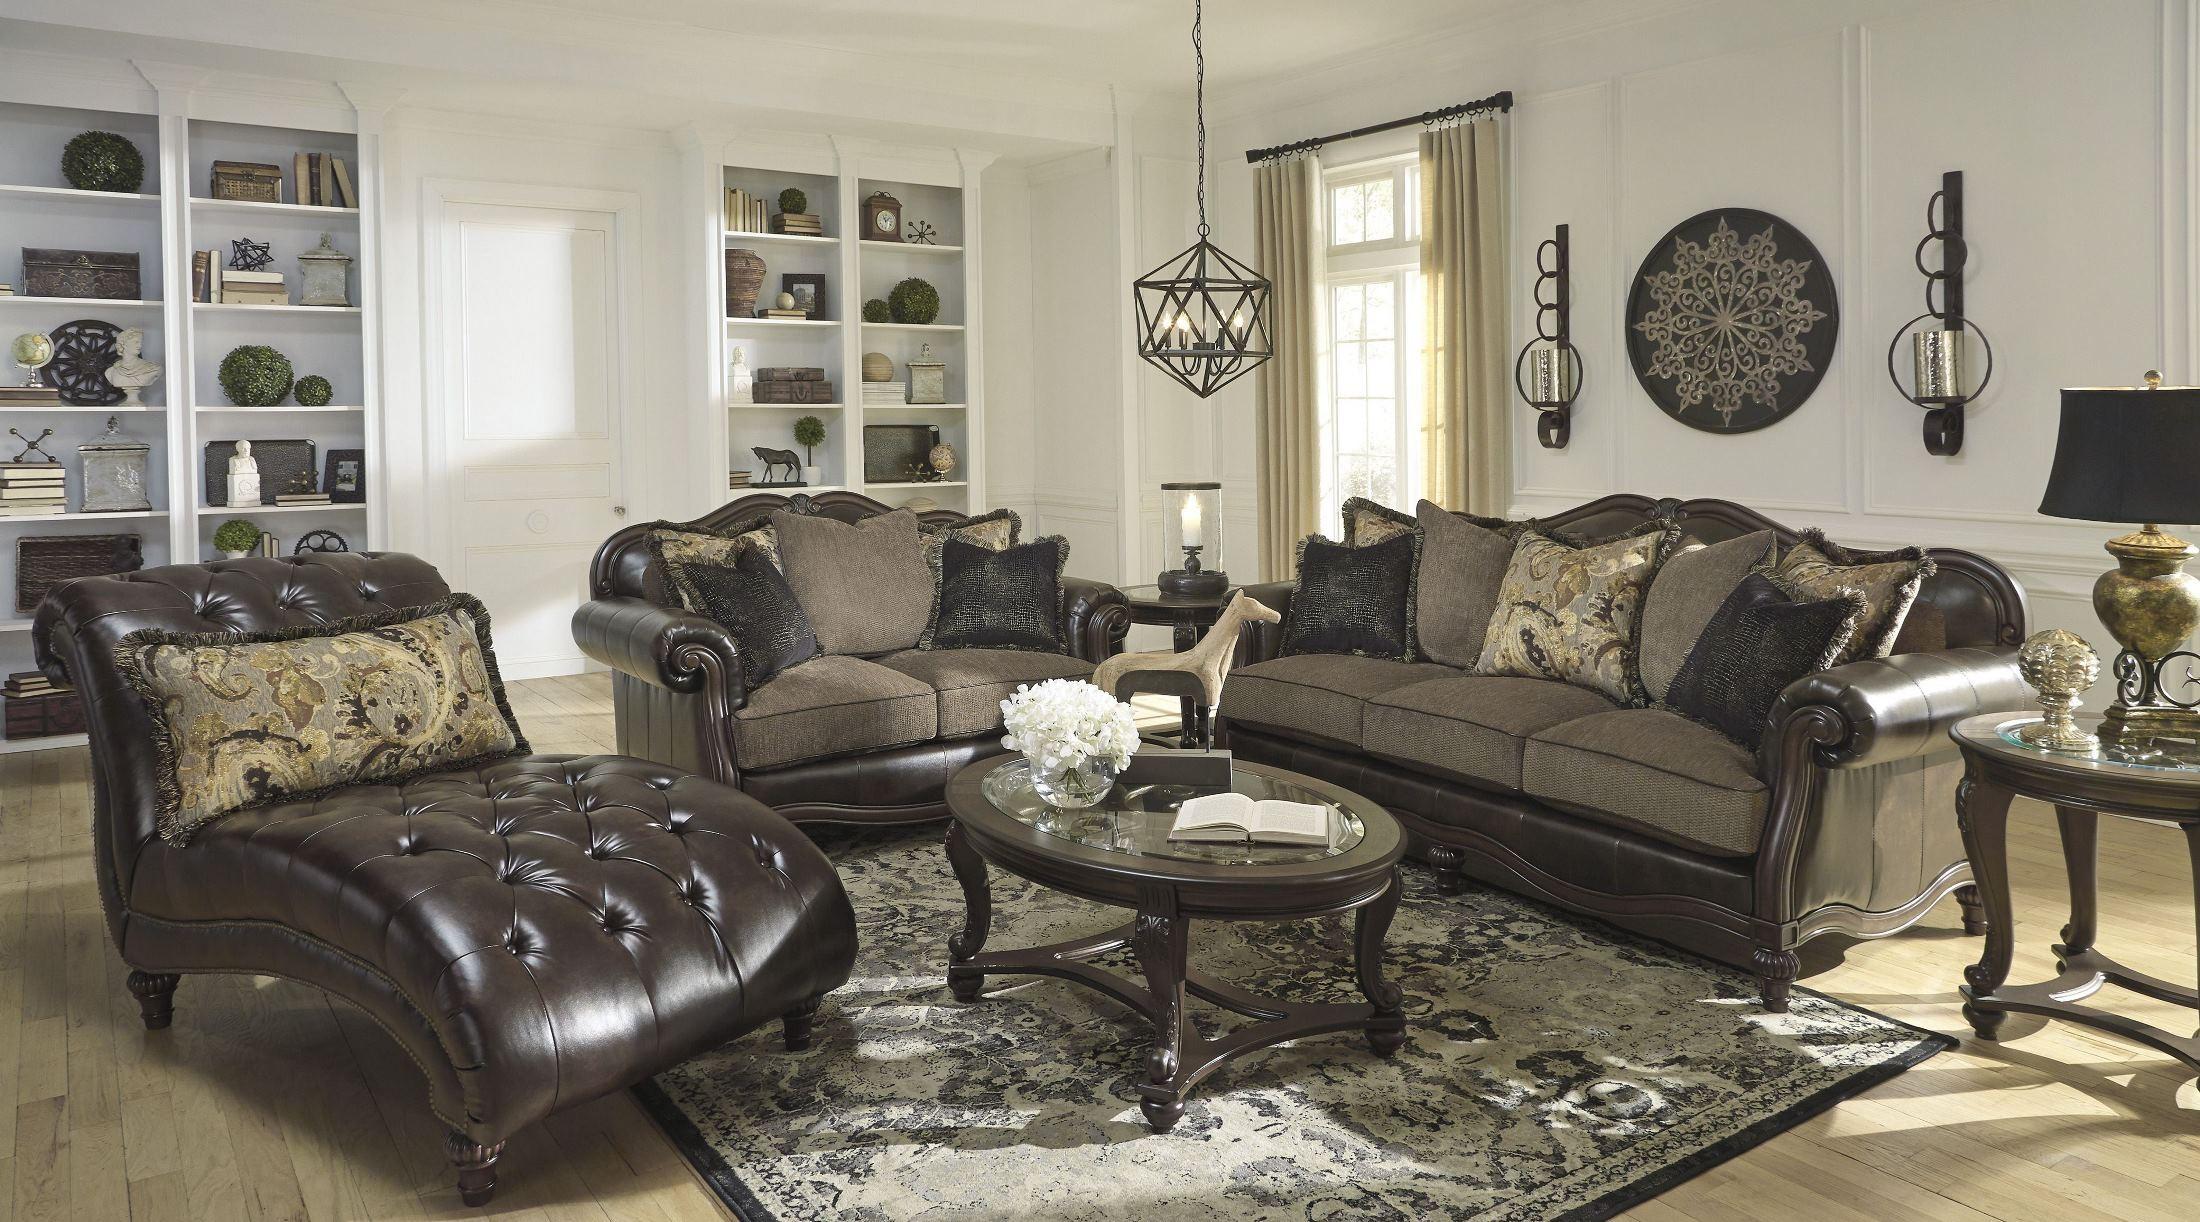 Winnsboro DuraBlend Vintage Living Room Set 5560238 Ashley